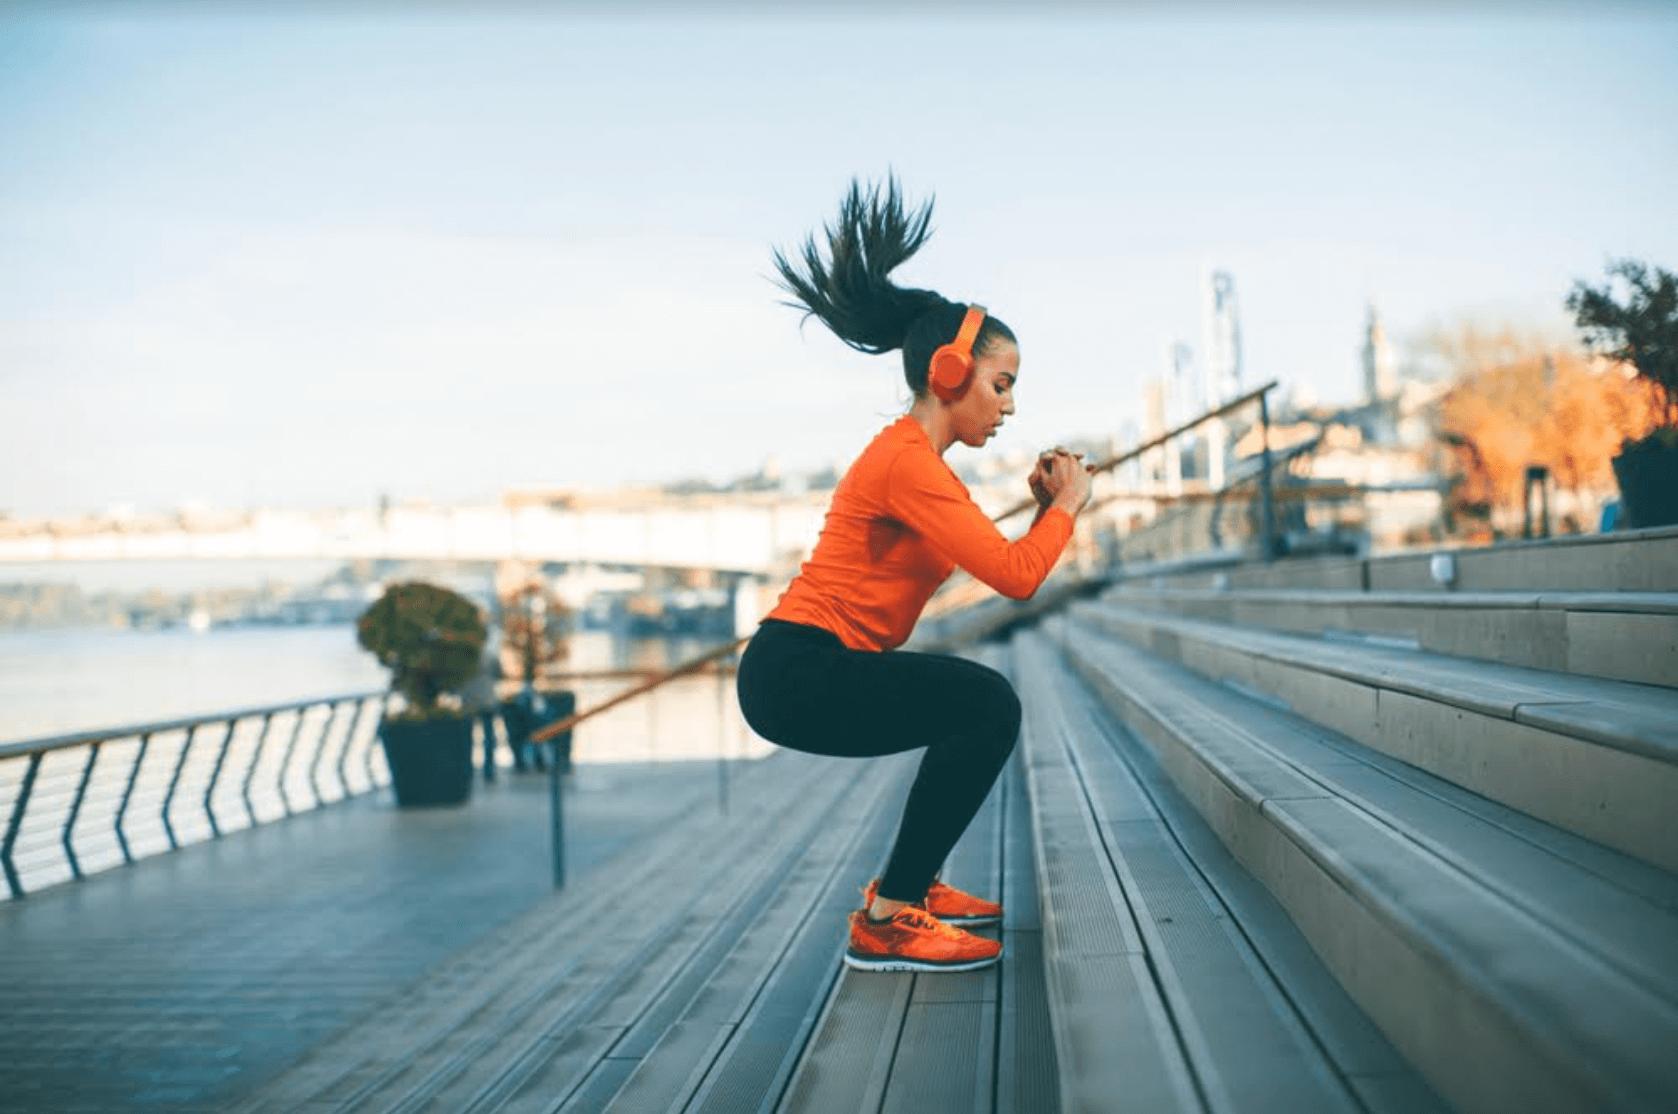 Five Ways to Improve Your Self-Esteem